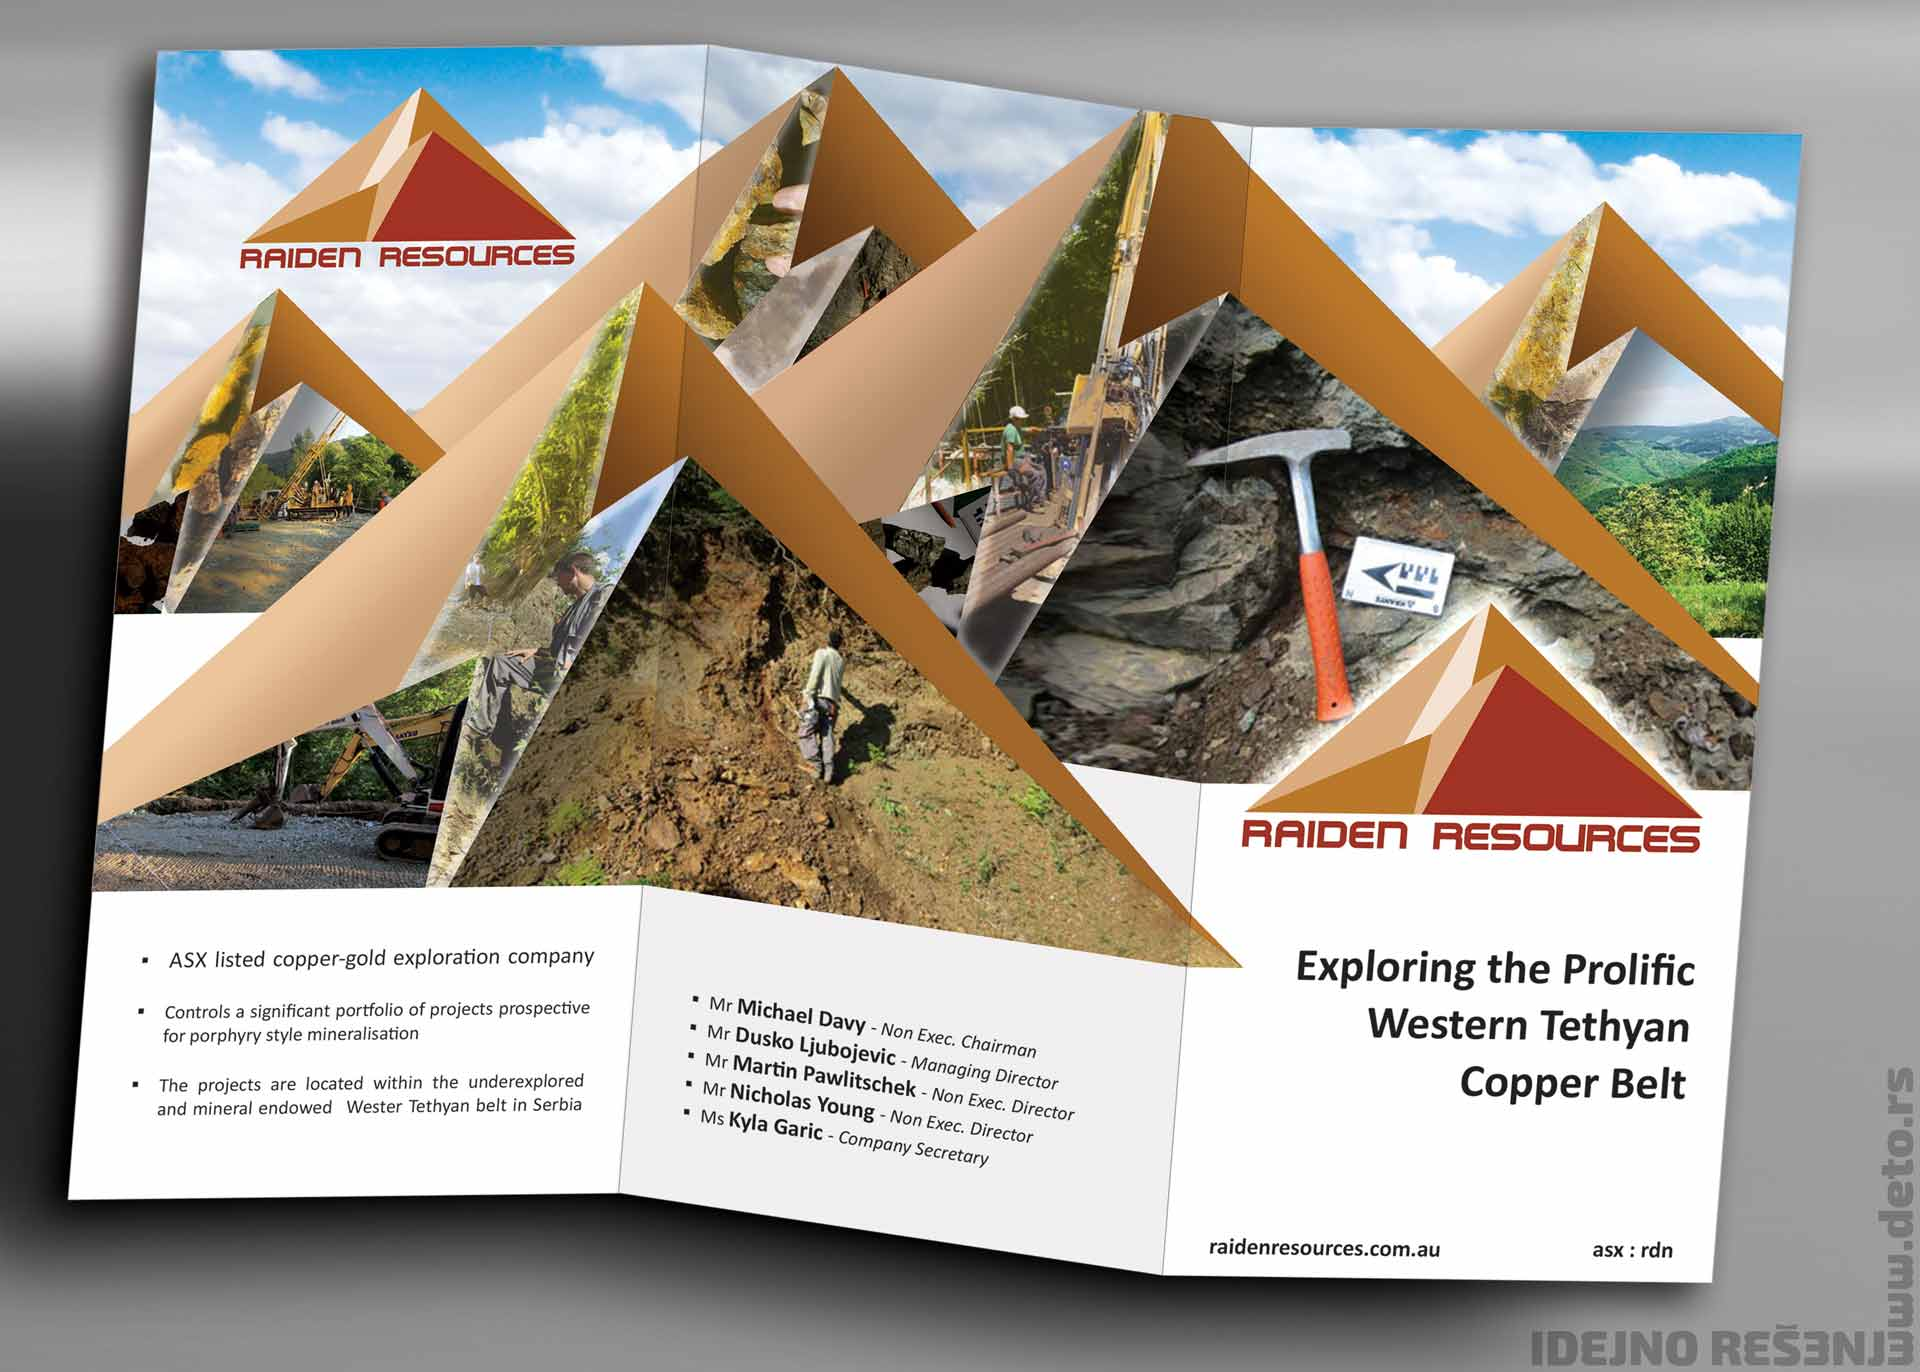 Dizajn - Idejno rešenje flajera A4 (a) / Raiden resources (Australija)